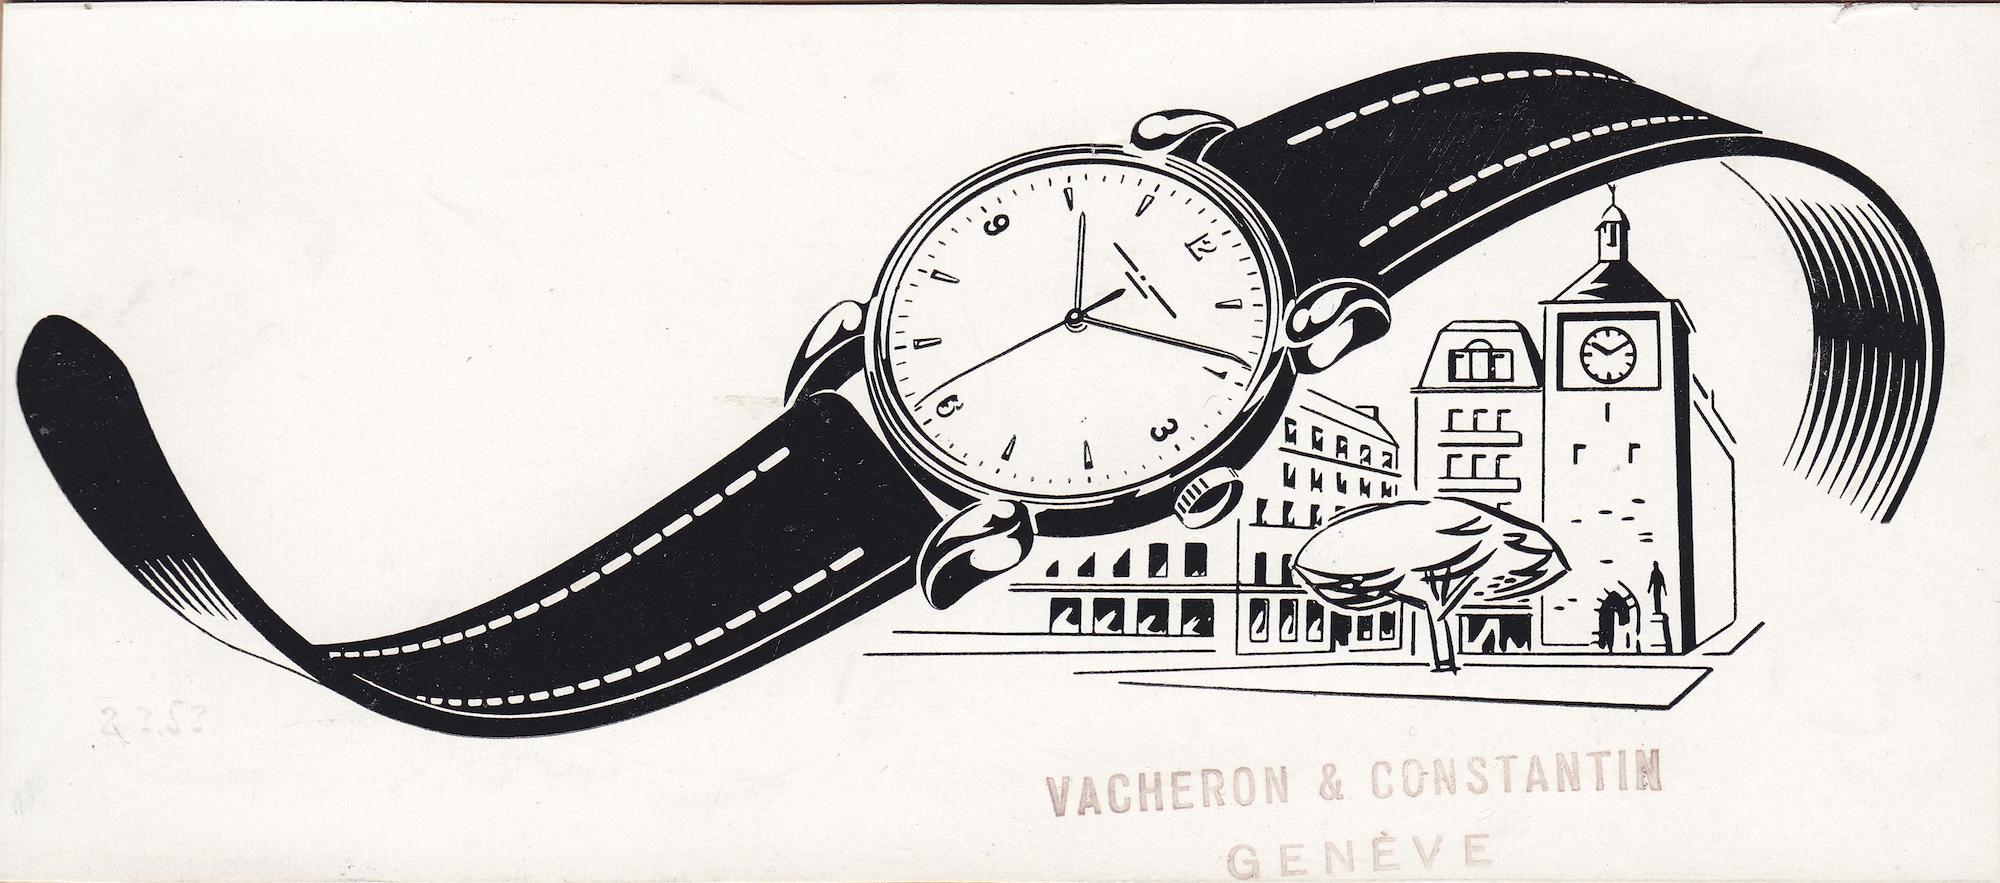 Vacheron Constantin Cornes de Vache Chronograph vintage advert - 2